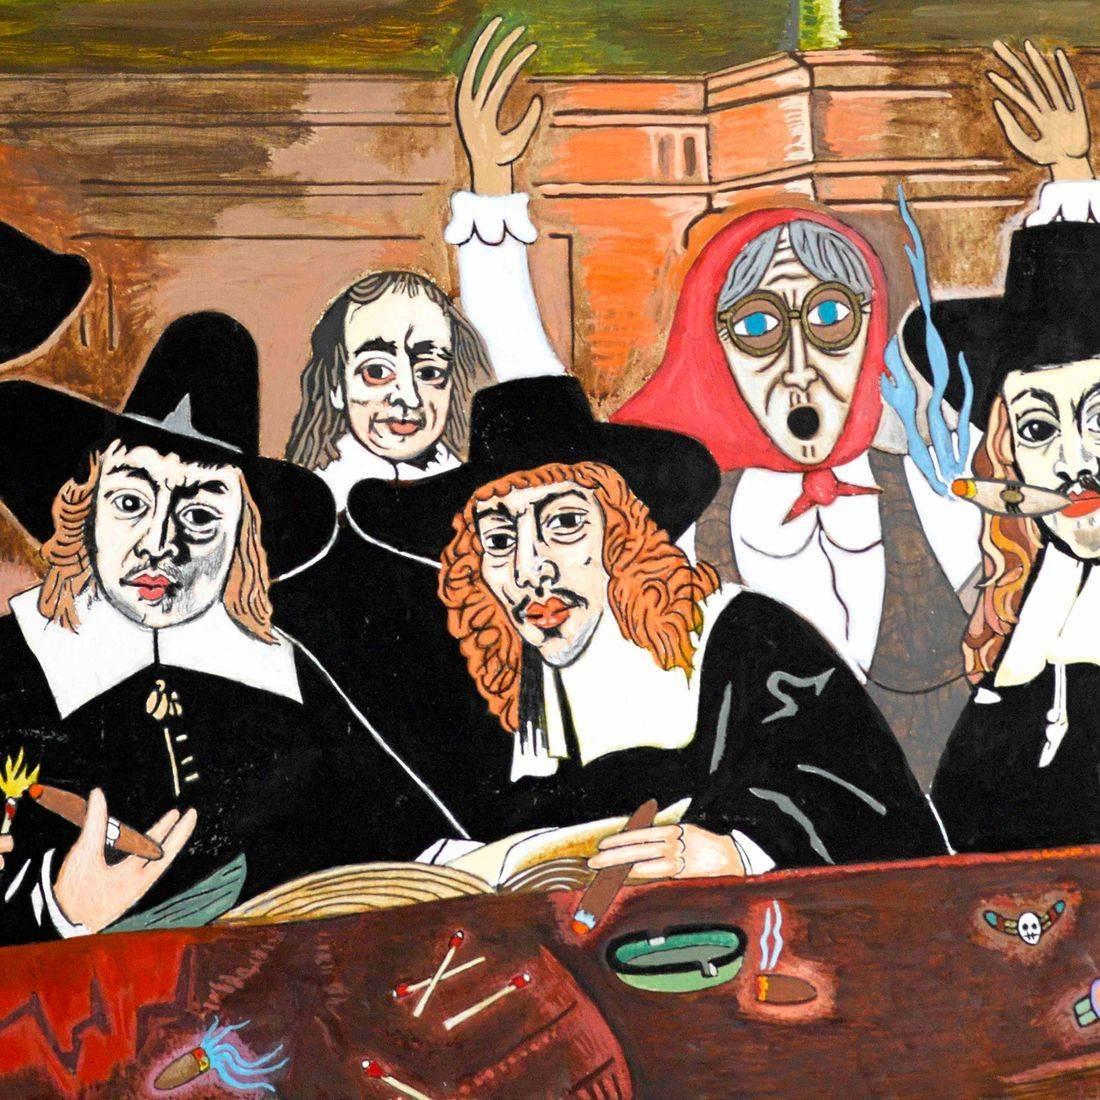 Dutch Masters, Rembrandt, Smoking, Smoking Cessation, Grandmother, Cigar Bar, Dutch Masters Cigars, Lung Cancer